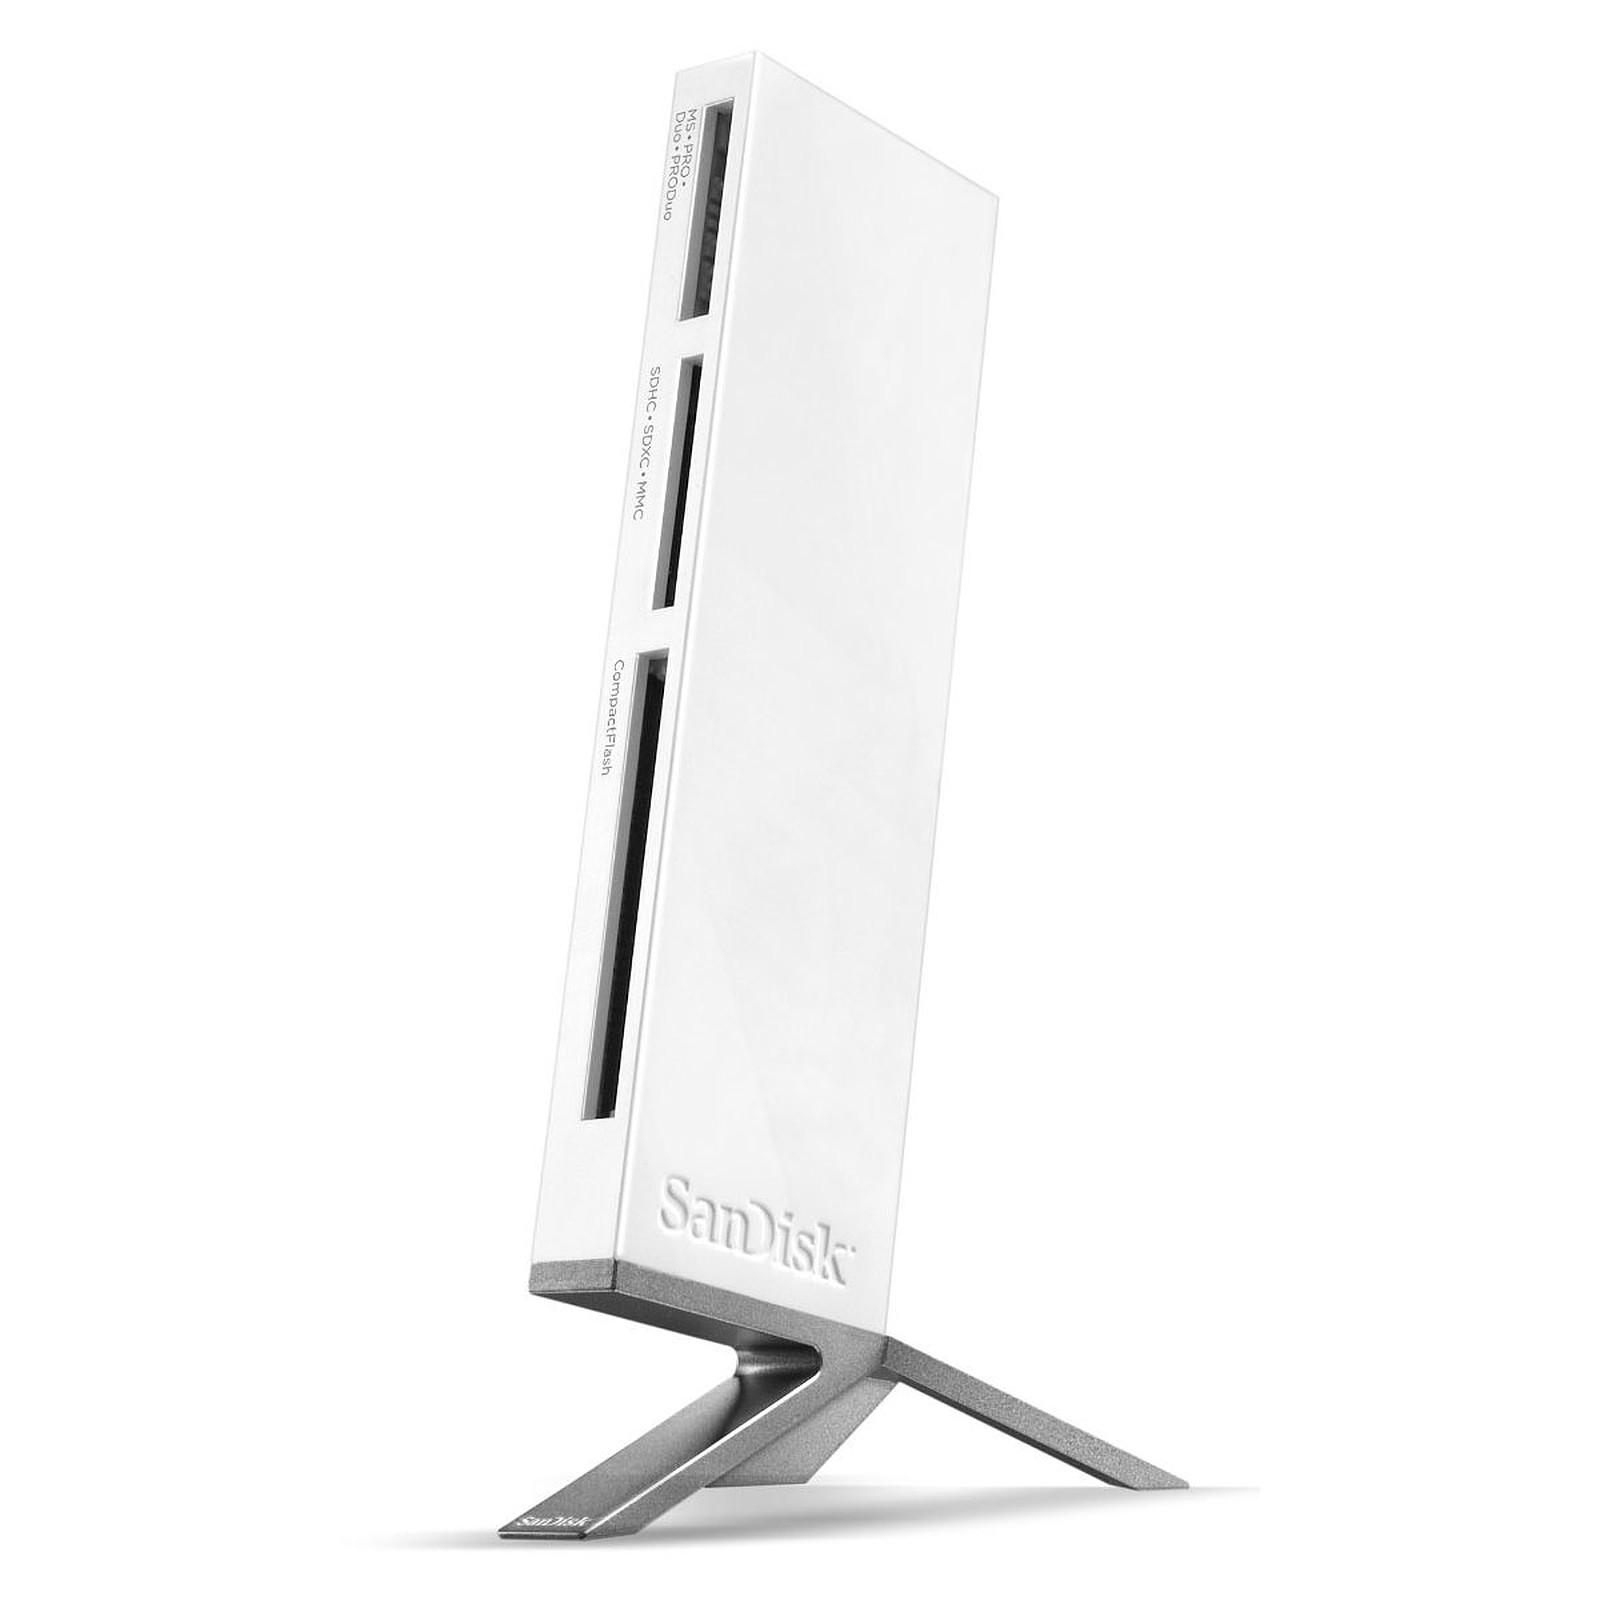 SanDisk ImageMate USB 3.0